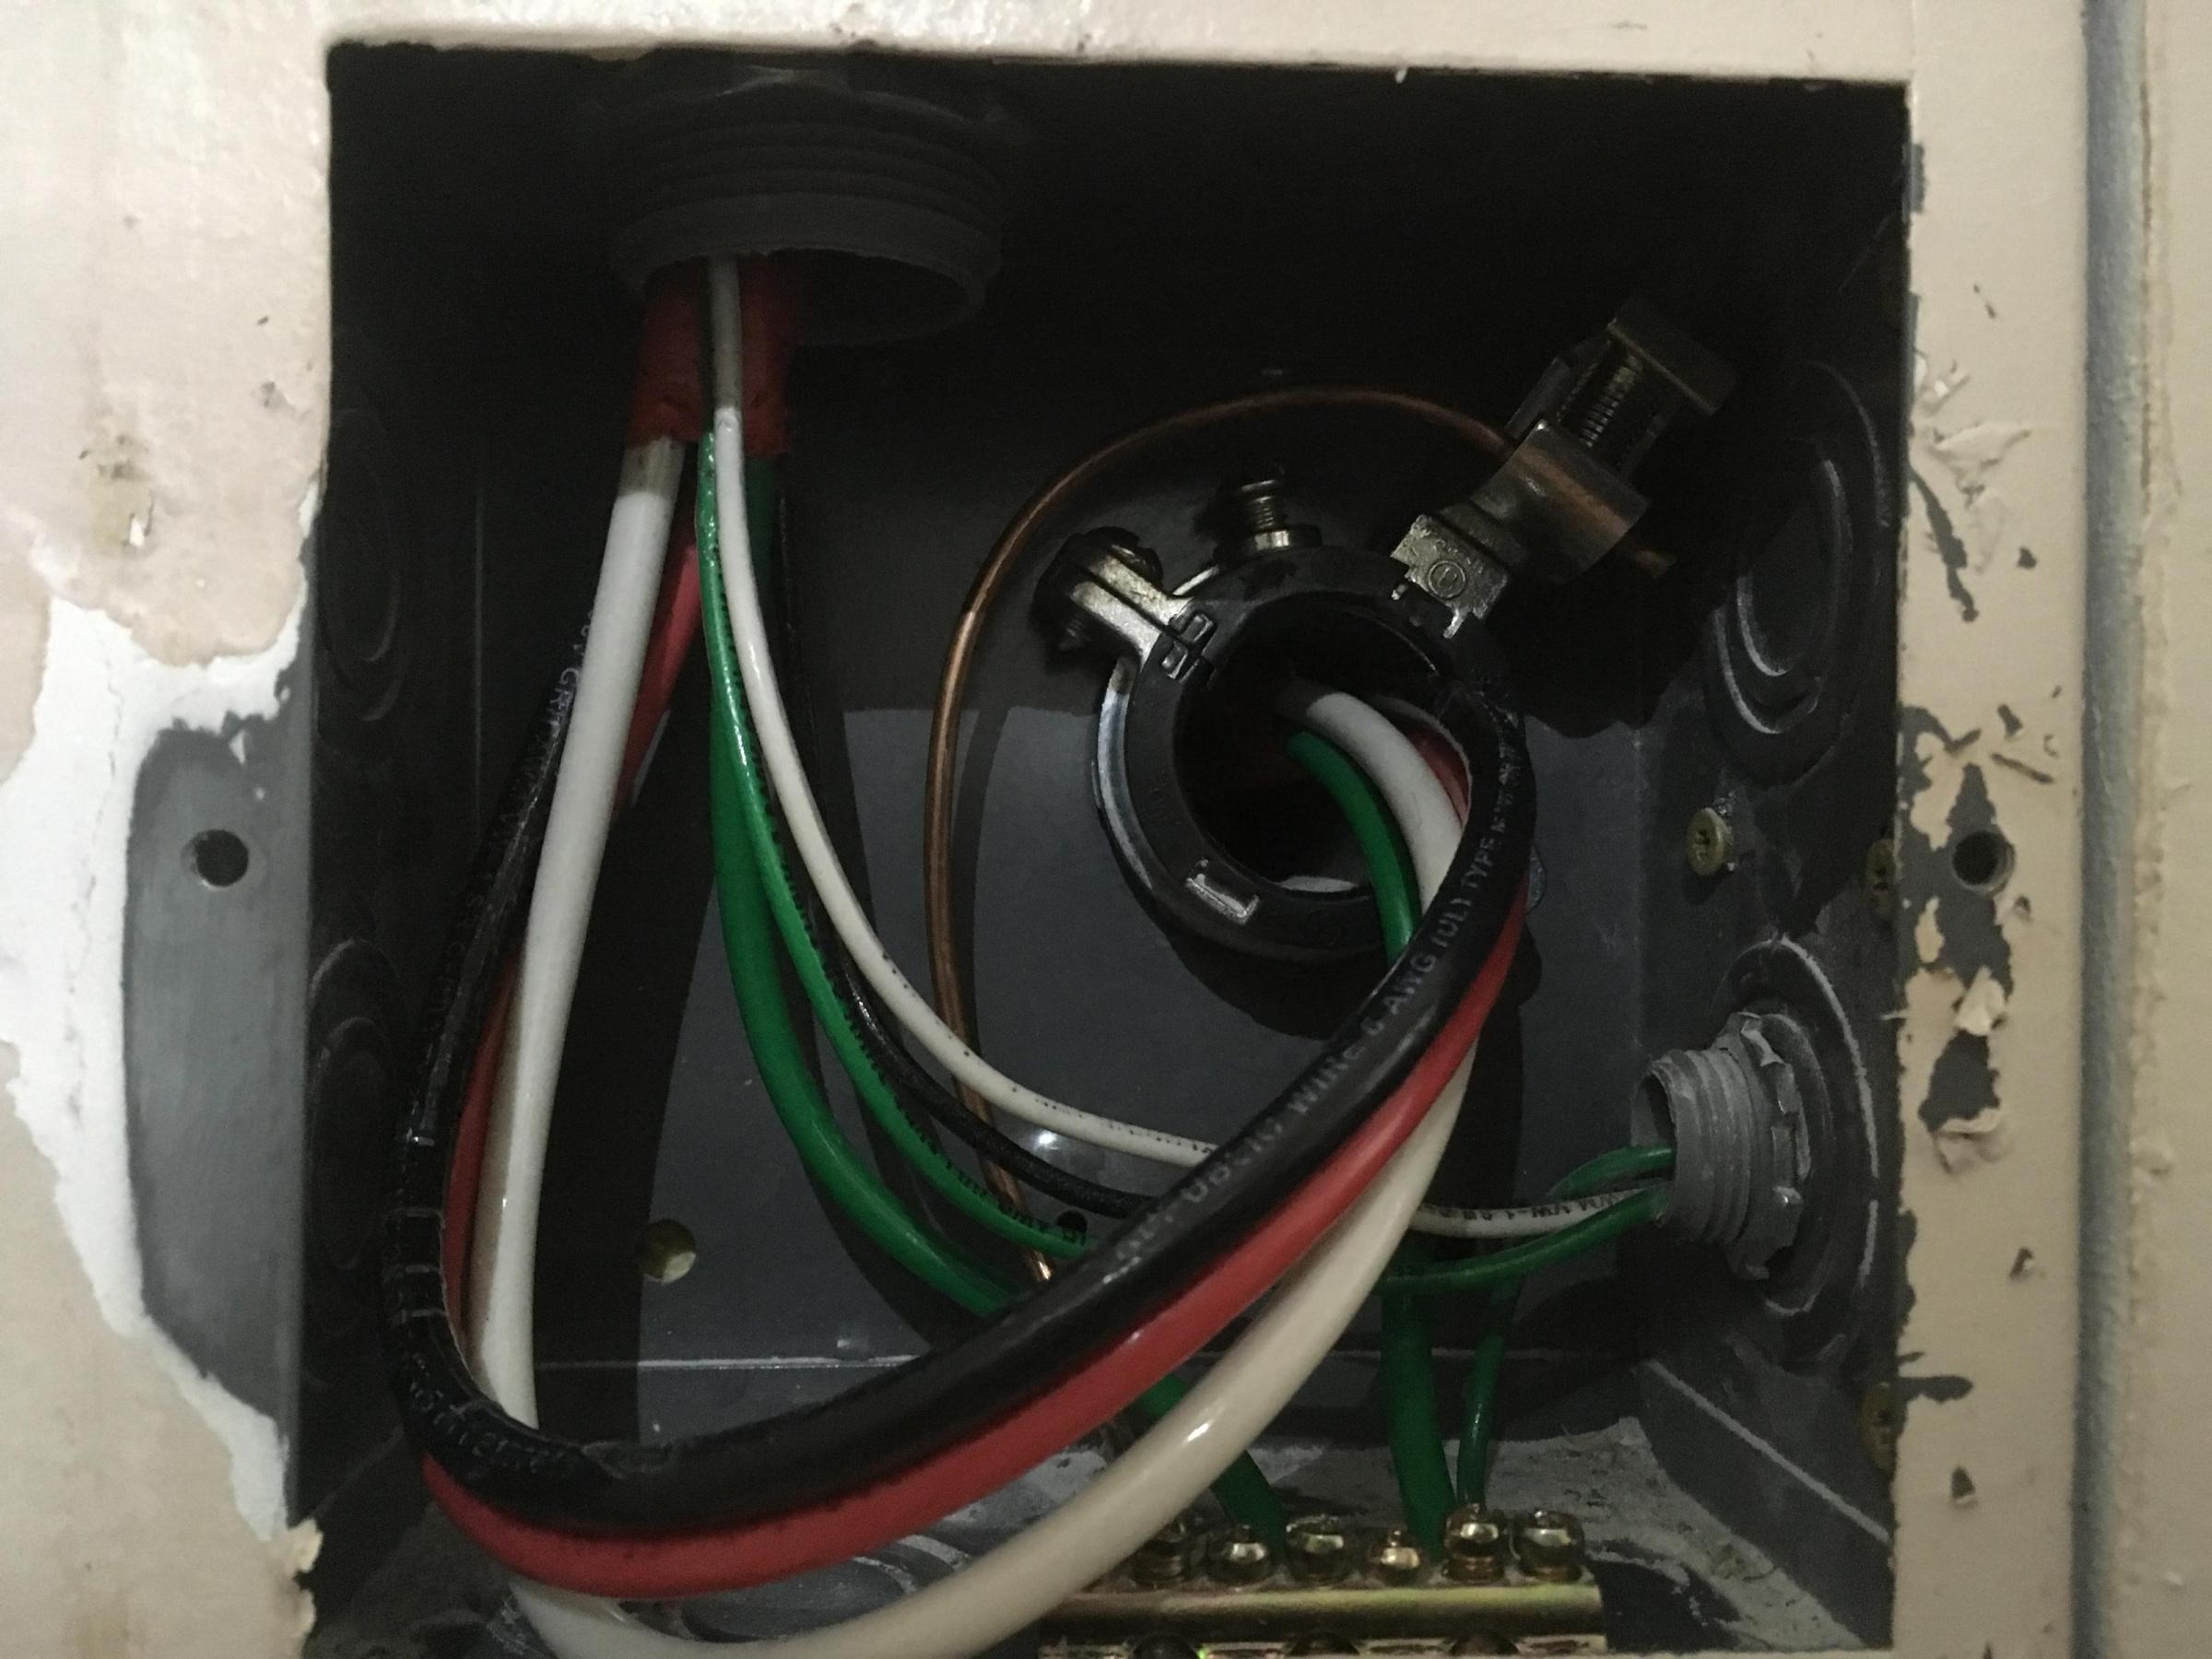 Conduit Grounding-44cb1460-403f-41fd-acb3-59461ec5d88a_1556806767154.jpg